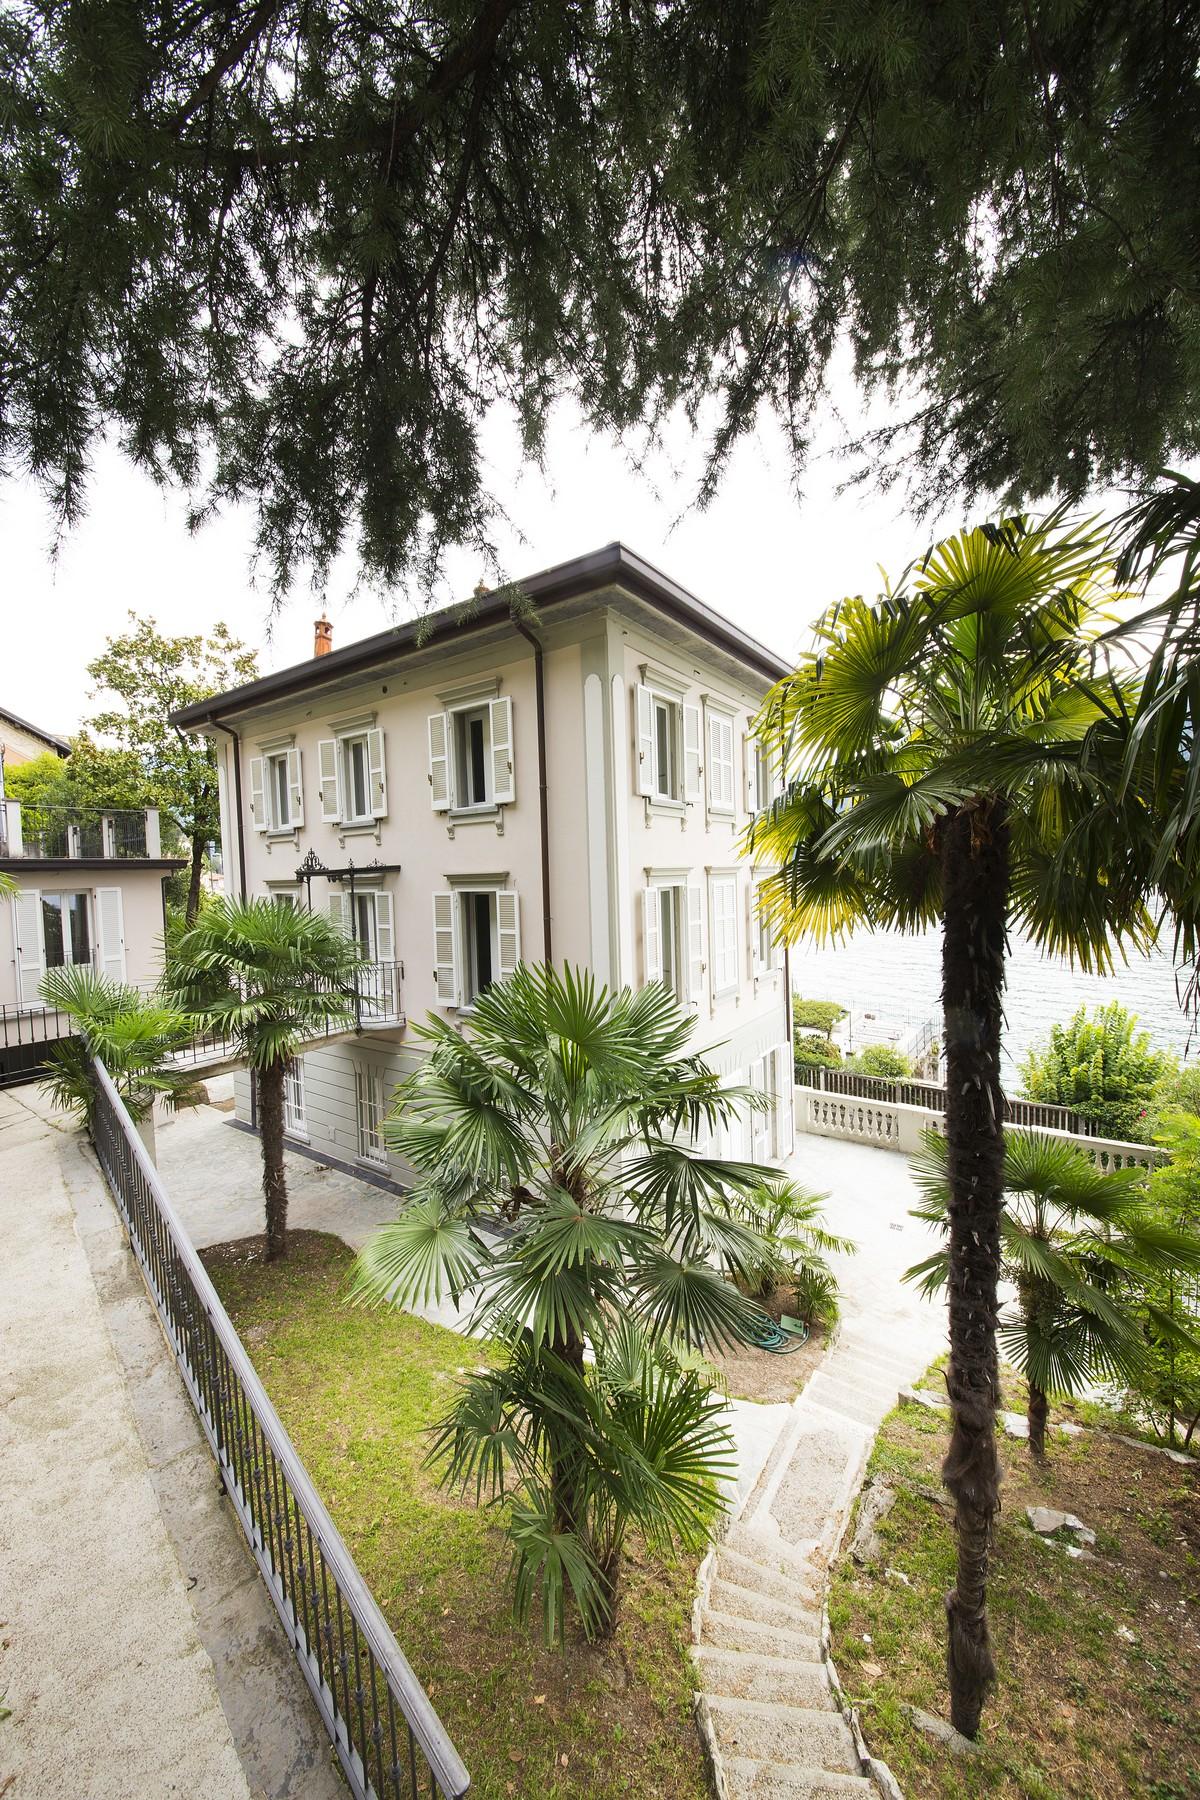 Additional photo for property listing at Fantastic villa liberty pieds dans l'eau on Lake Como Via Regina Vecchia Carate Urio, Como 22010 Italy